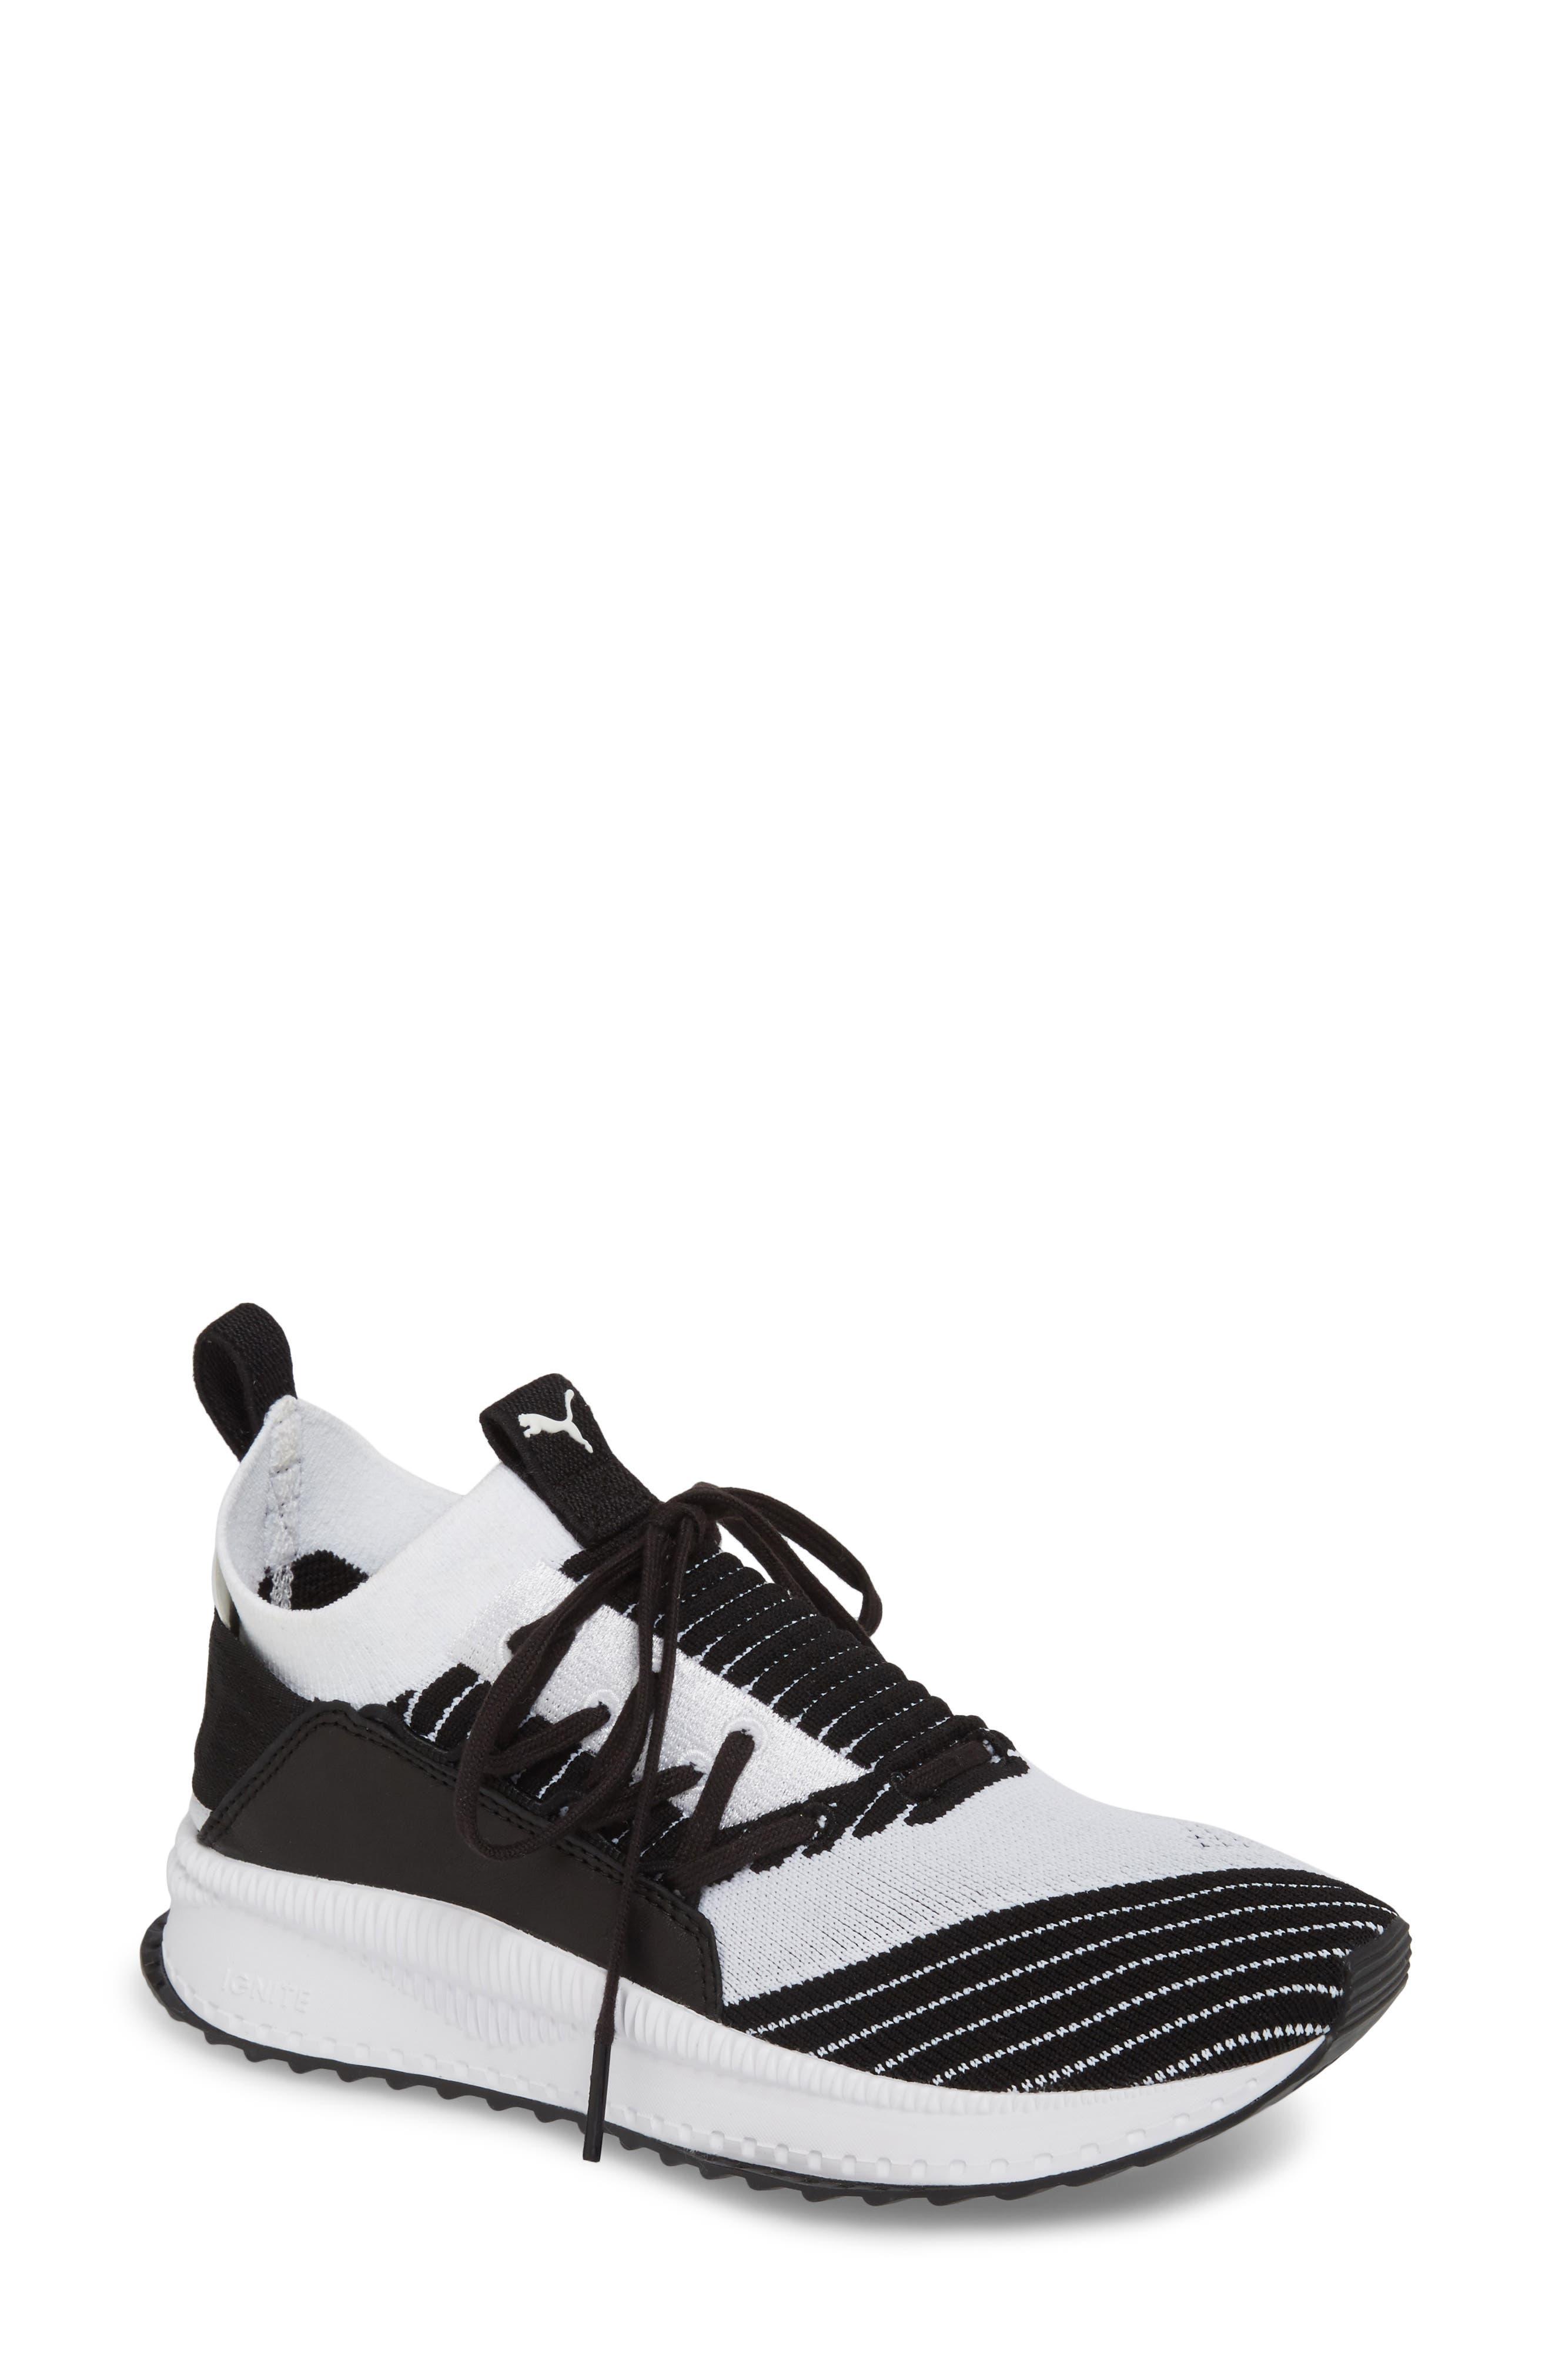 Tsugi Jun Knit Sneaker,                             Main thumbnail 2, color,